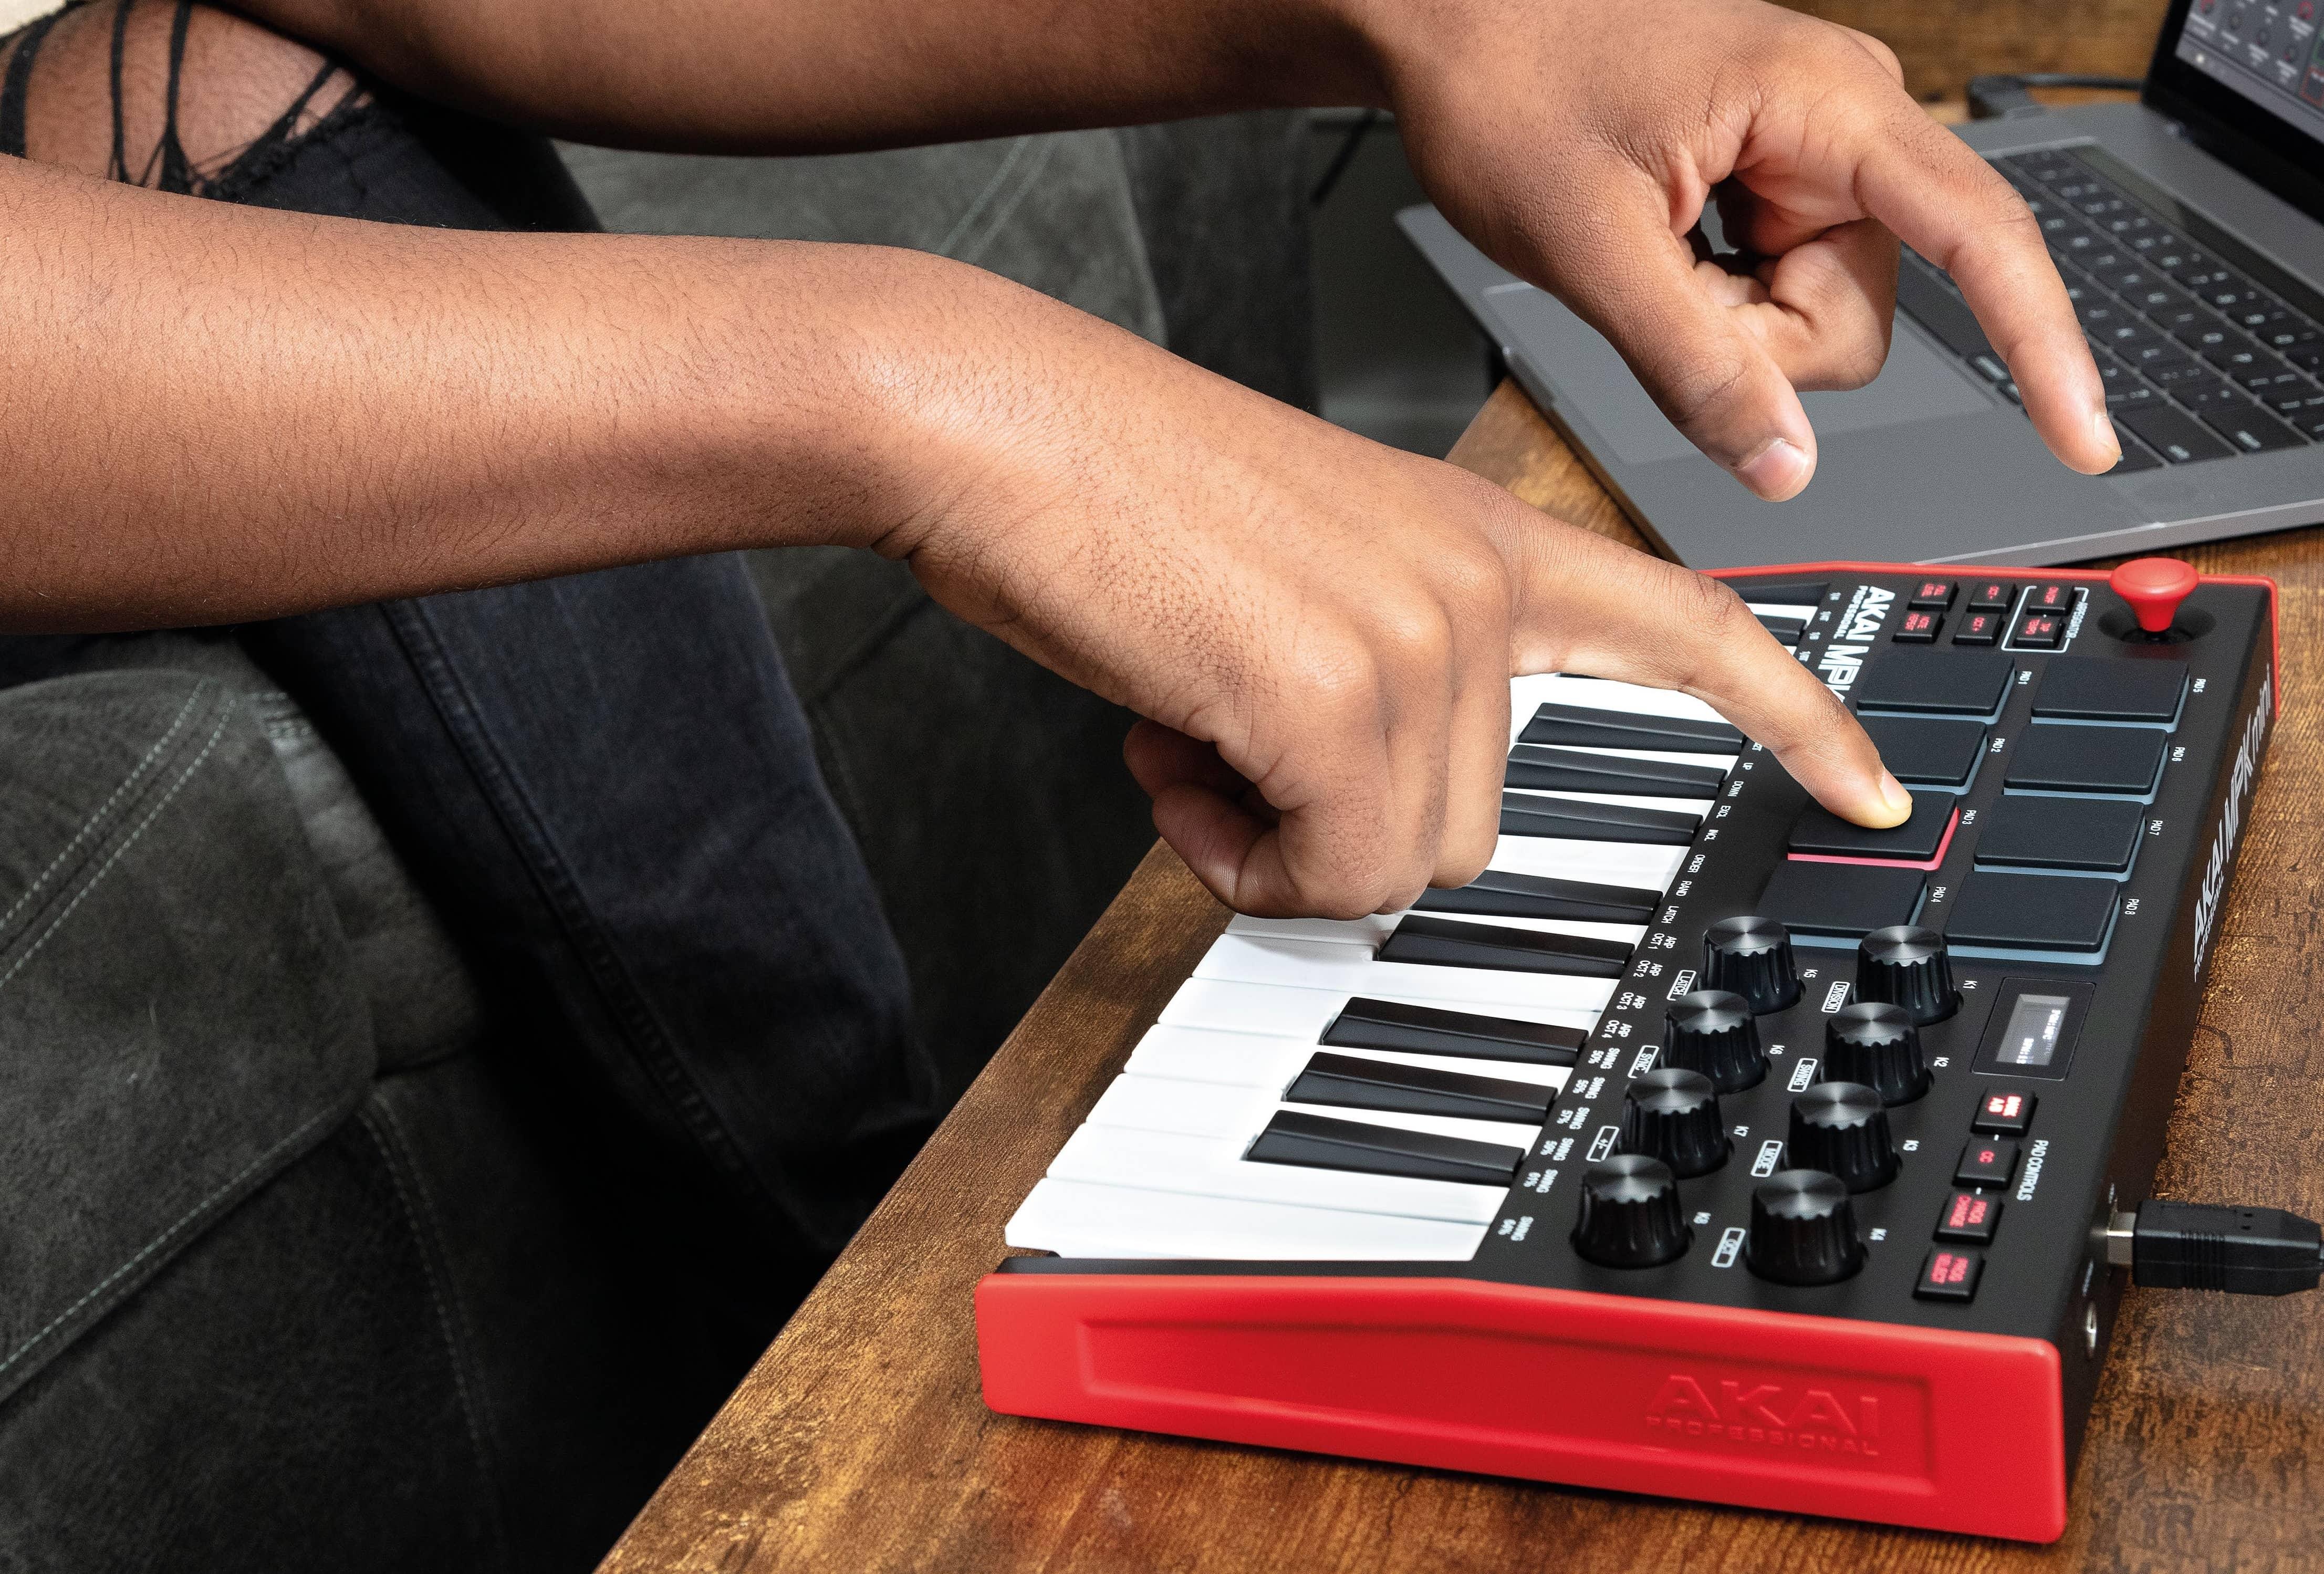 Akai's MPC Beats is a free 'beat-making DAW' for Mac/PC